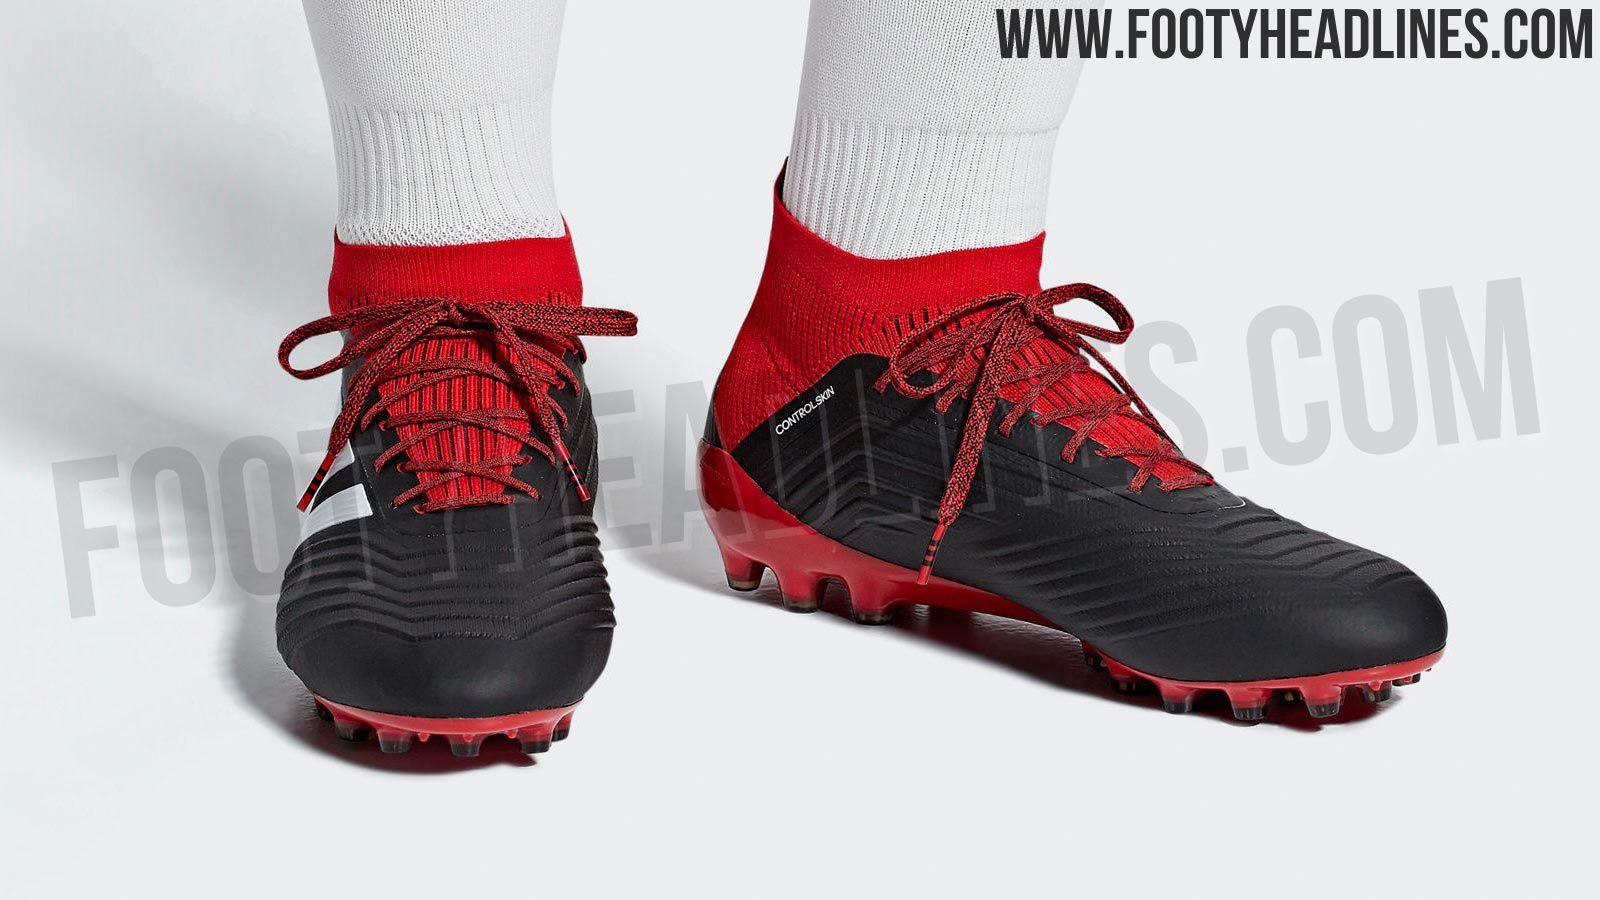 premium selection 4d730 0089e Stunning  Team Mode  Adidas Predator 2018-2019 Boots Leaked - Footy  Headlines